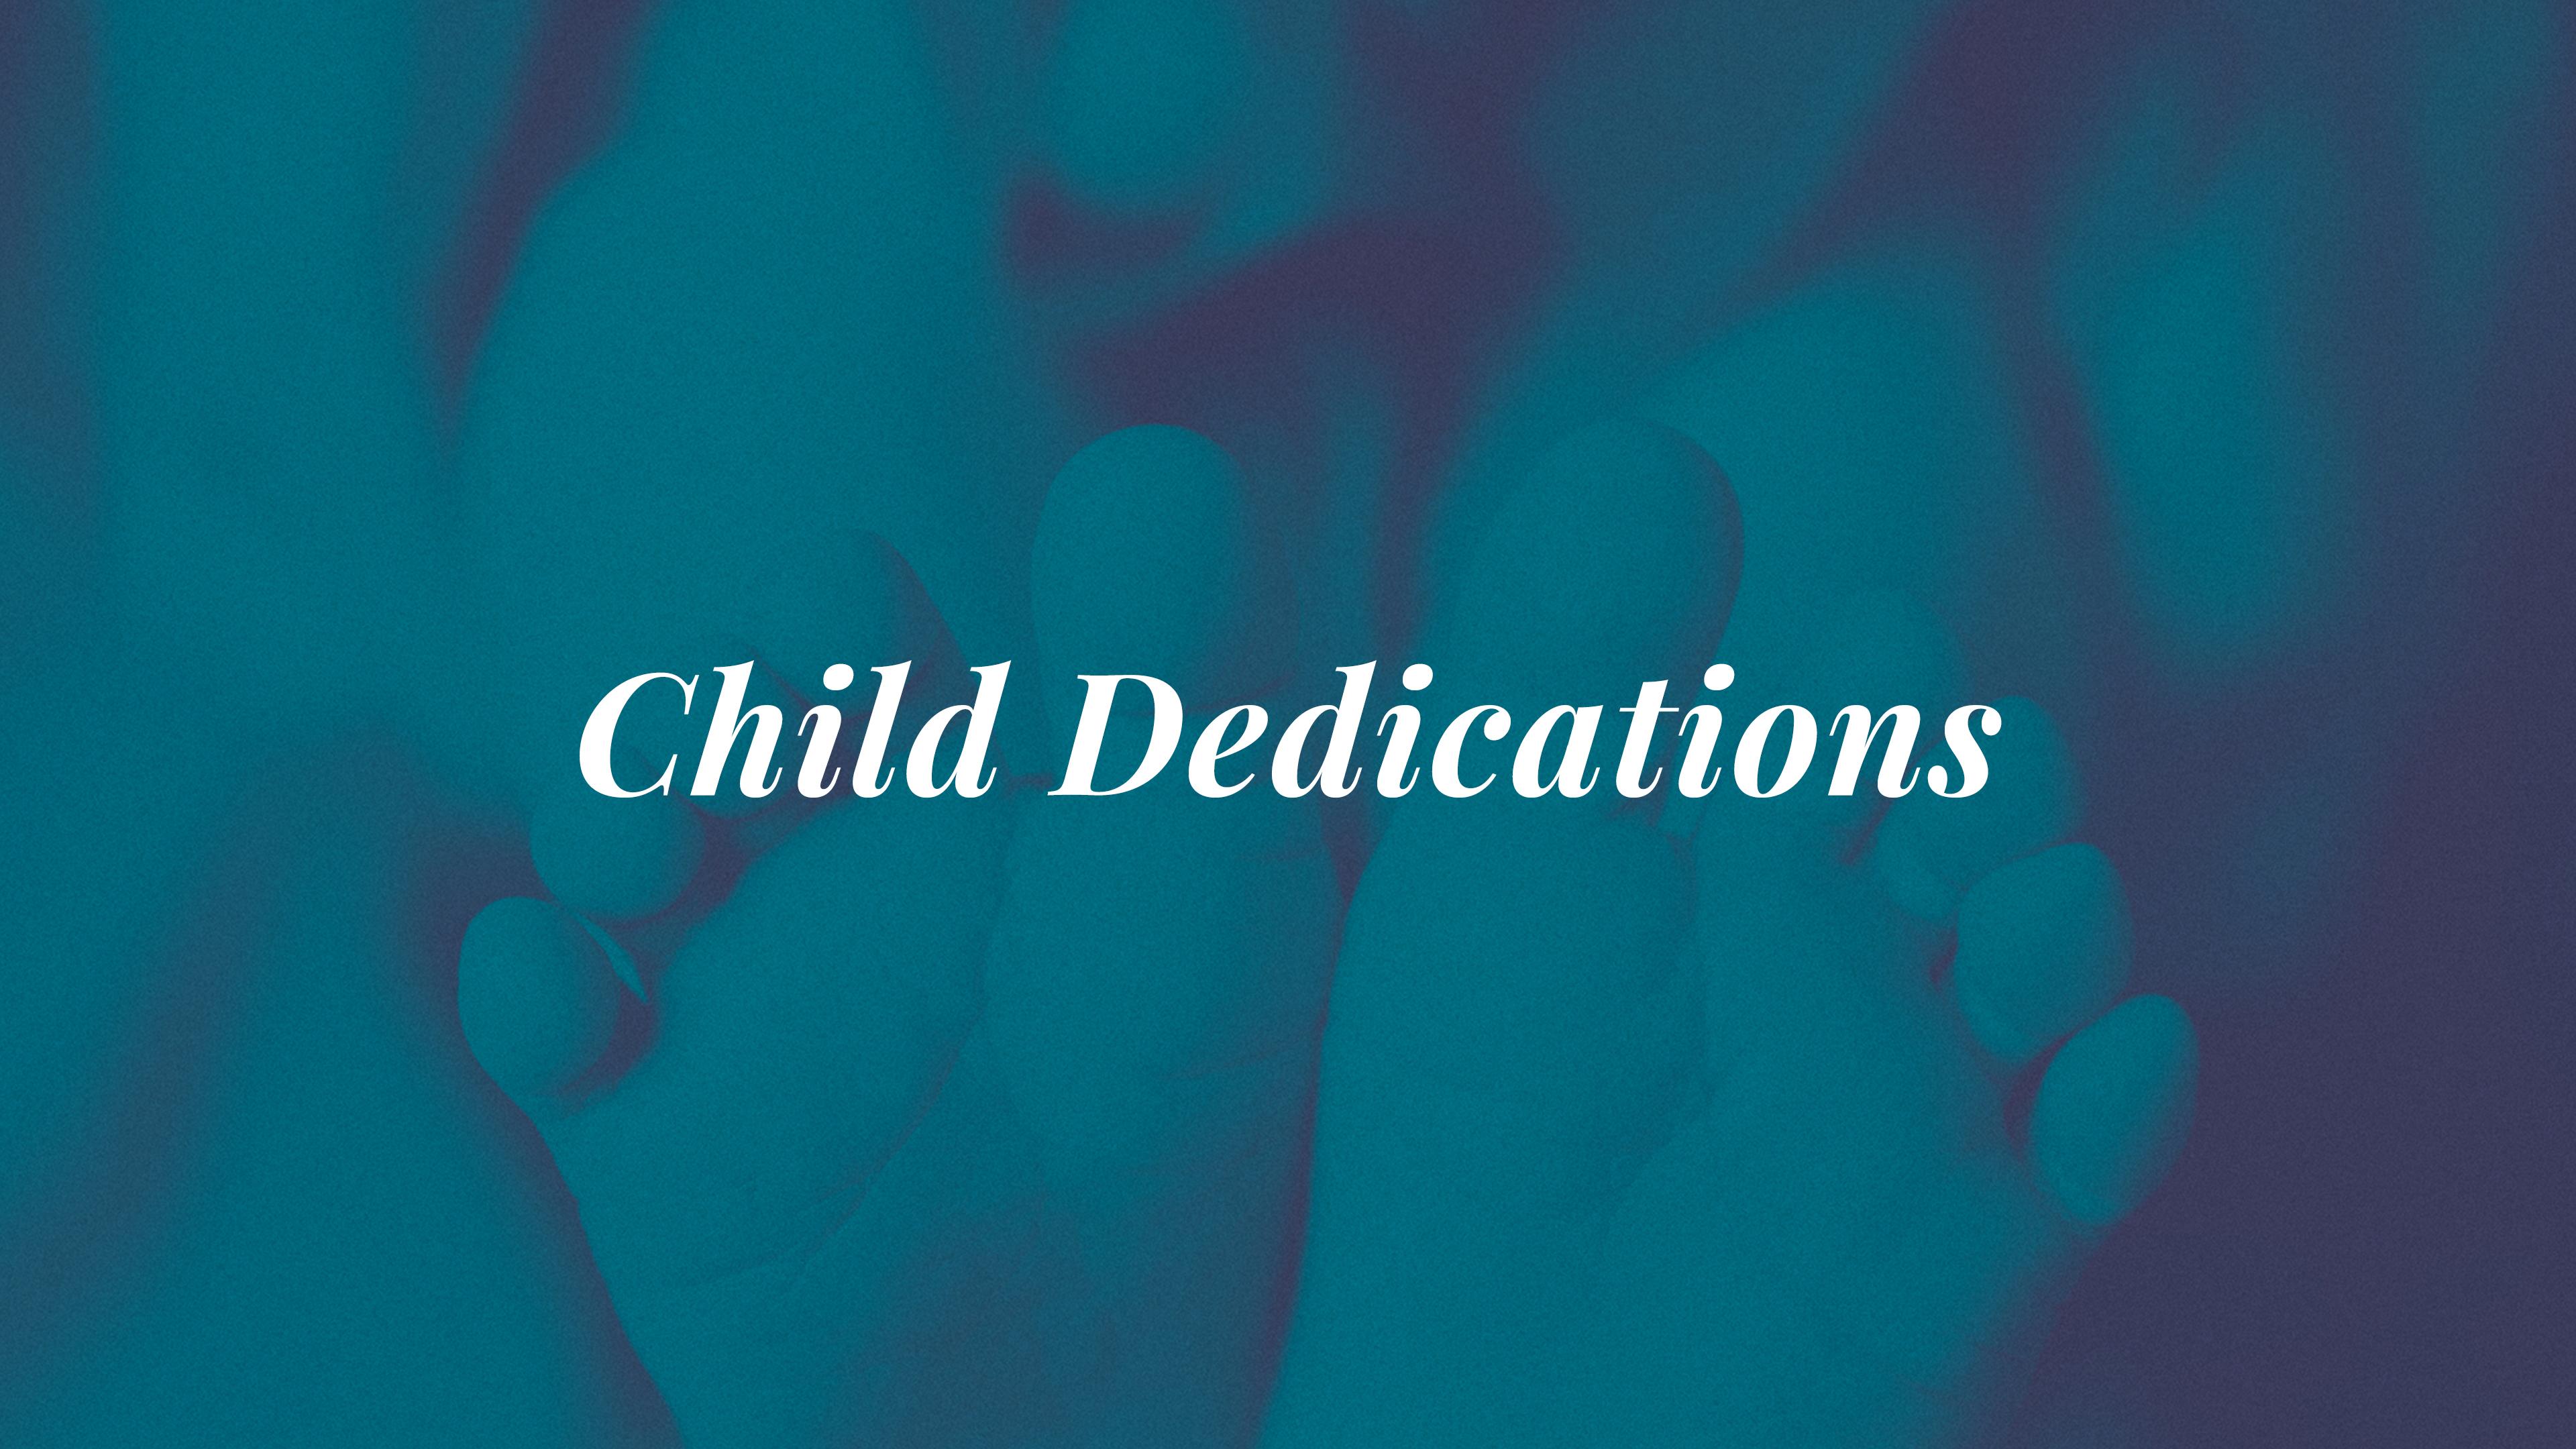 EDM | Child Dedications at Victory Church